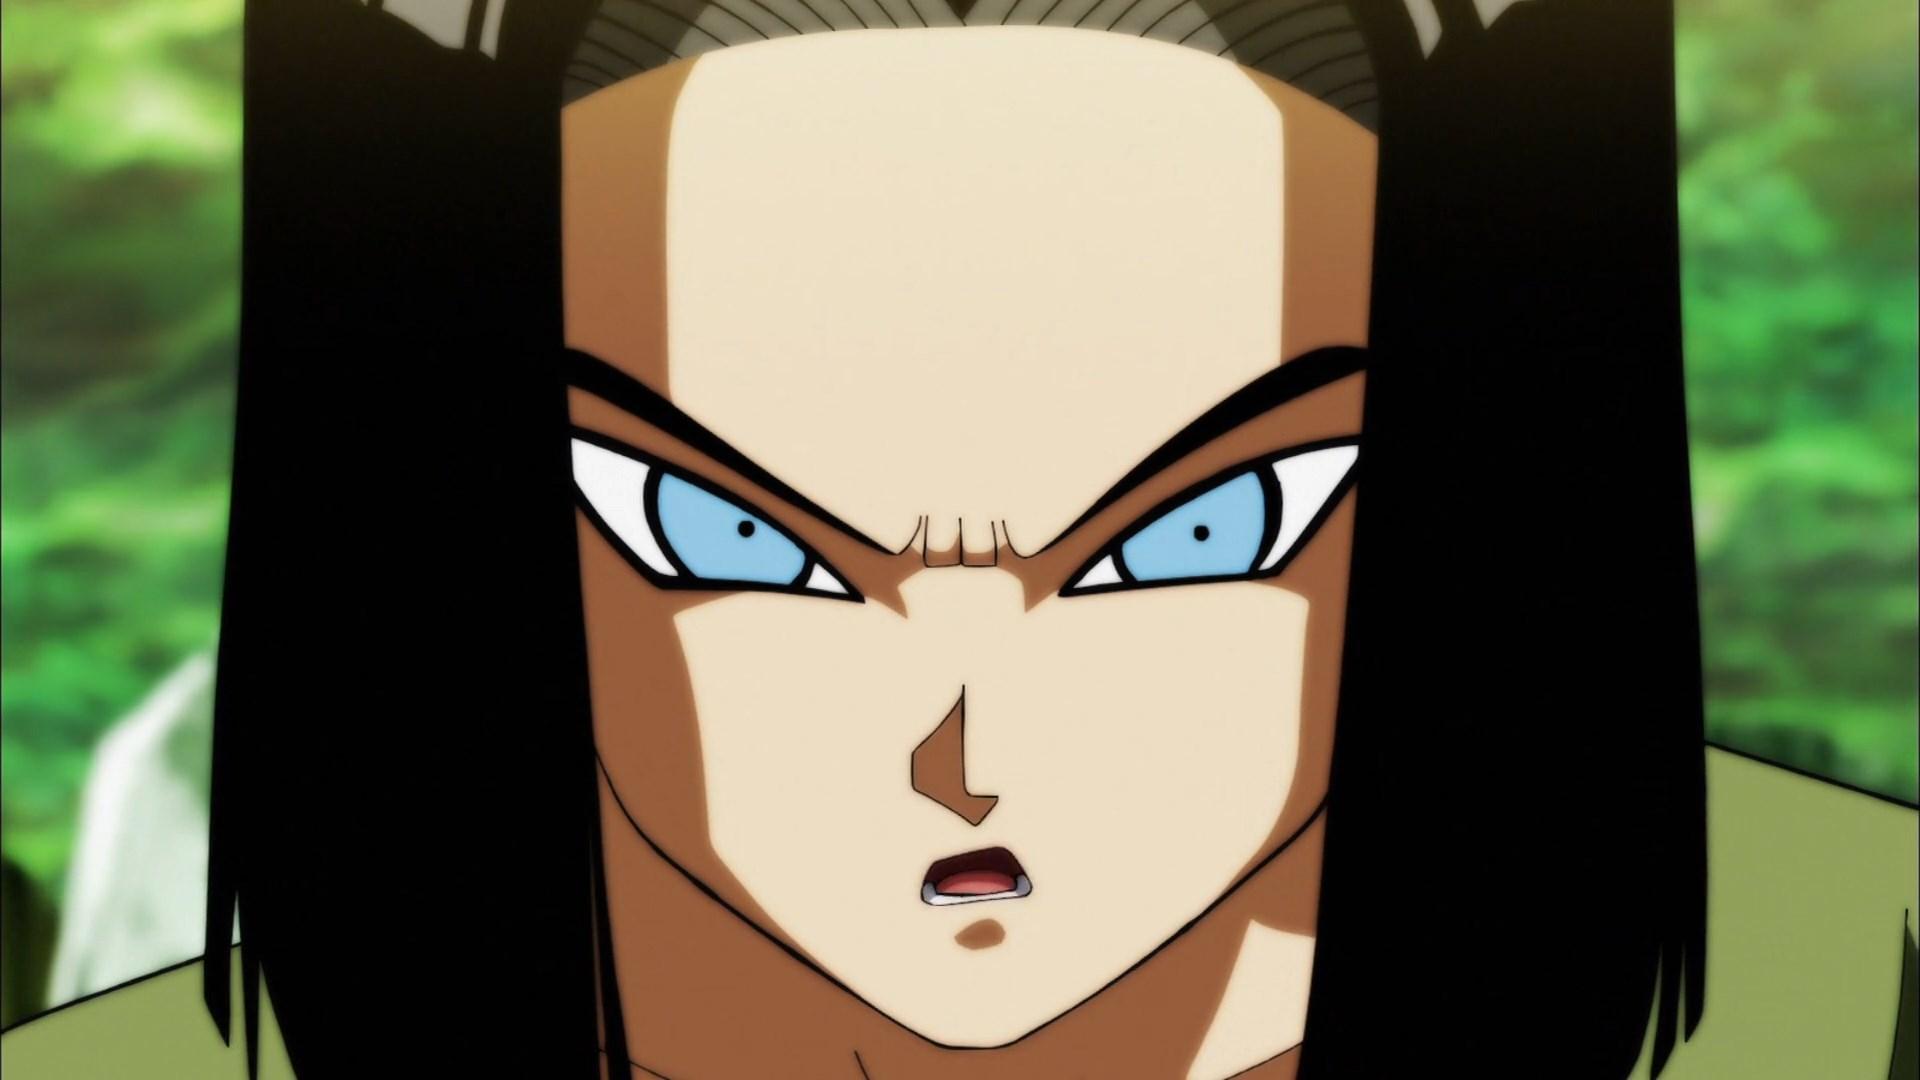 [HorribleSubs] Dragon Ball Super - 121 [1080p].mkv_snapshot_16.04